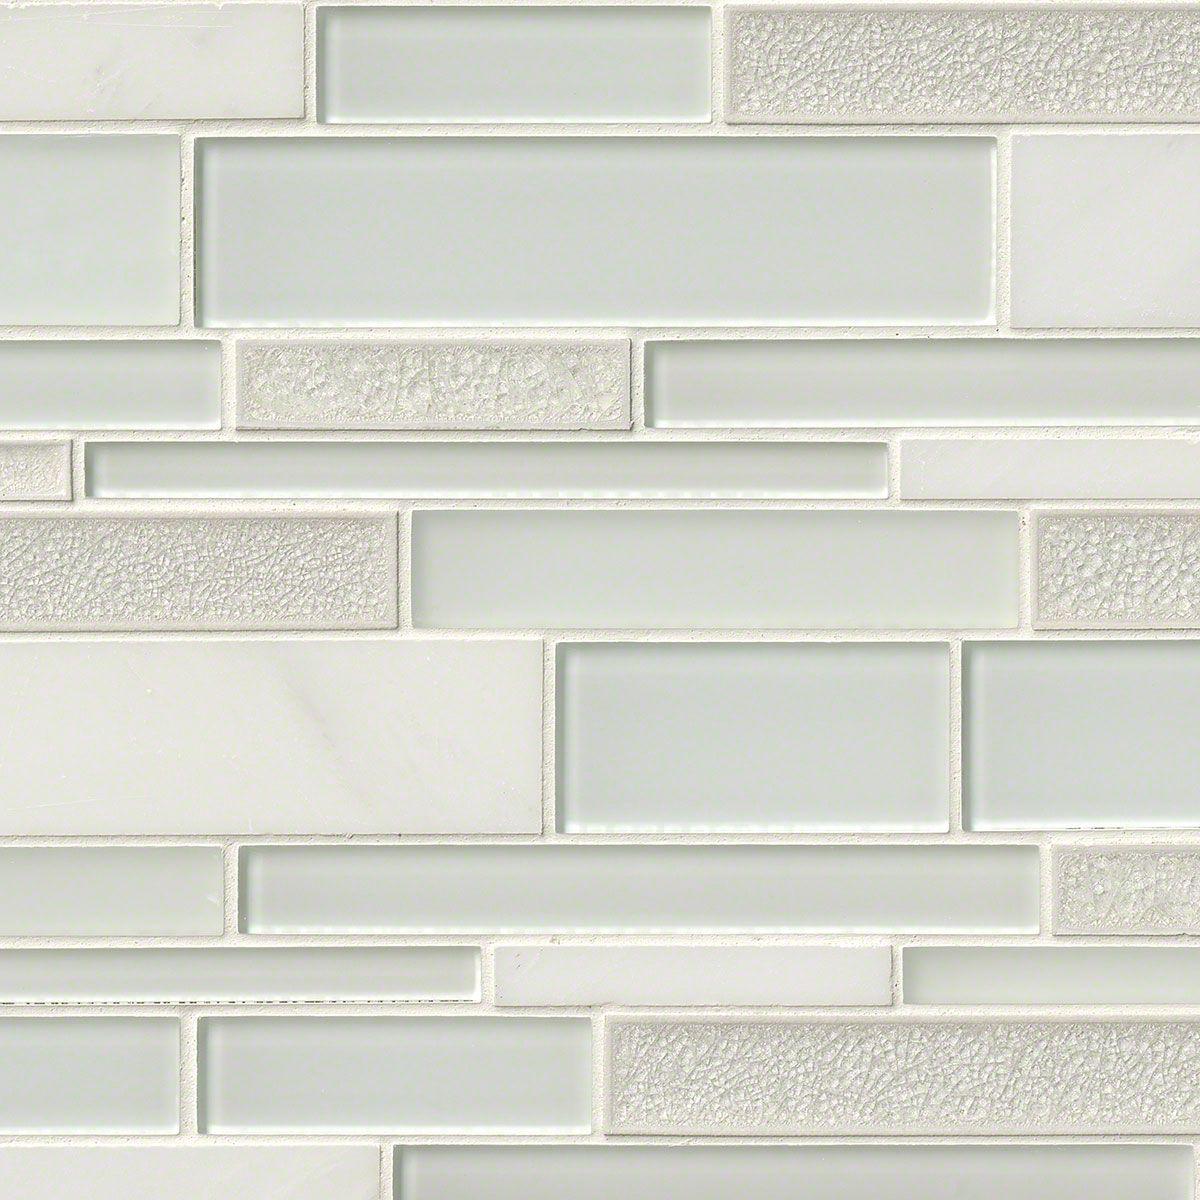 Fantasia blanco interlocking pattern 12x18x8 mm glass and stone fantasia blanco interlocking pattern 12x18x8 mm glass and stone mosaic backsplash tile dailygadgetfo Gallery